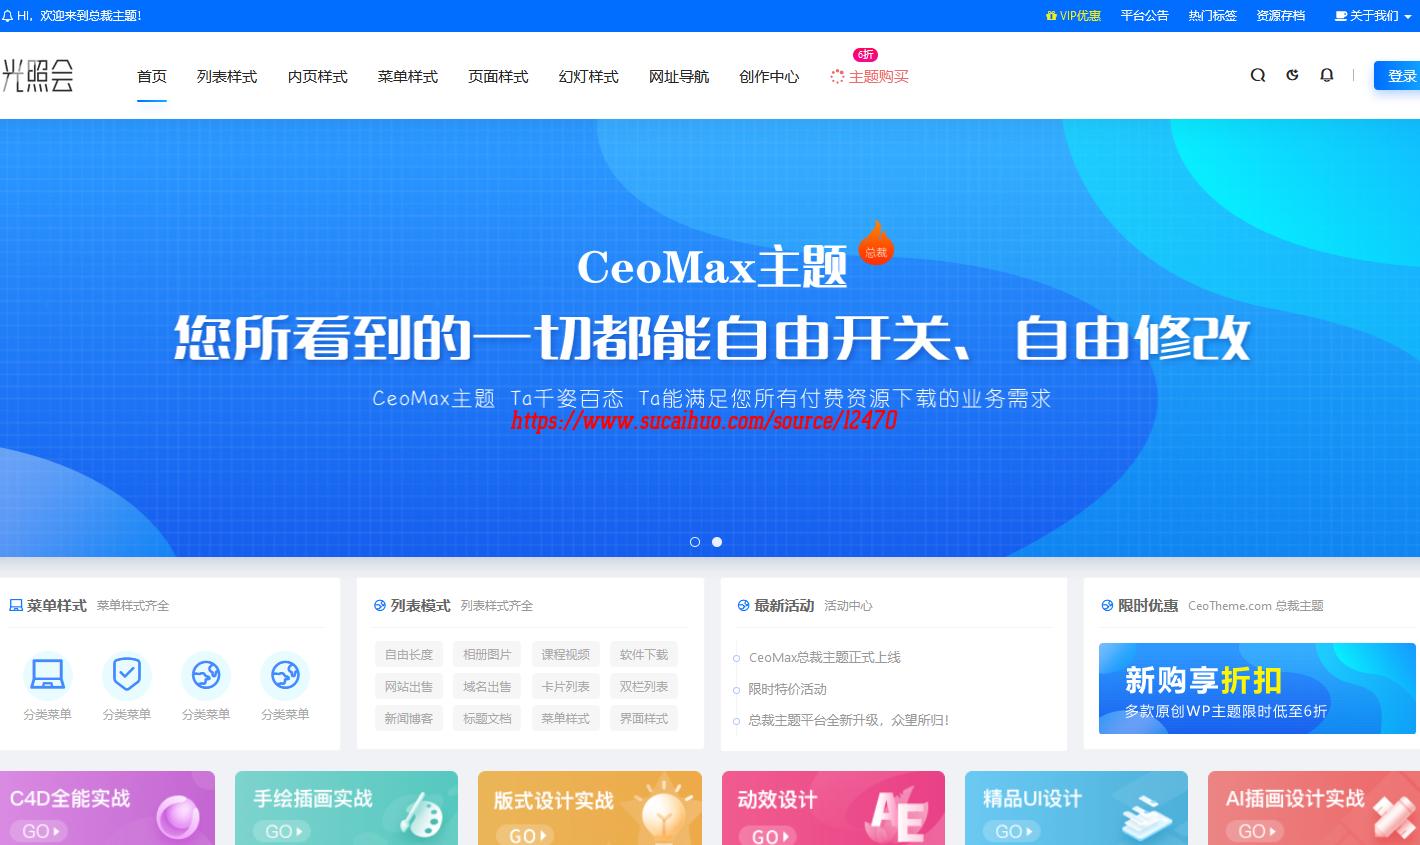 CEOMAX总裁主题wordpress蓝色清爽资源素材下载站